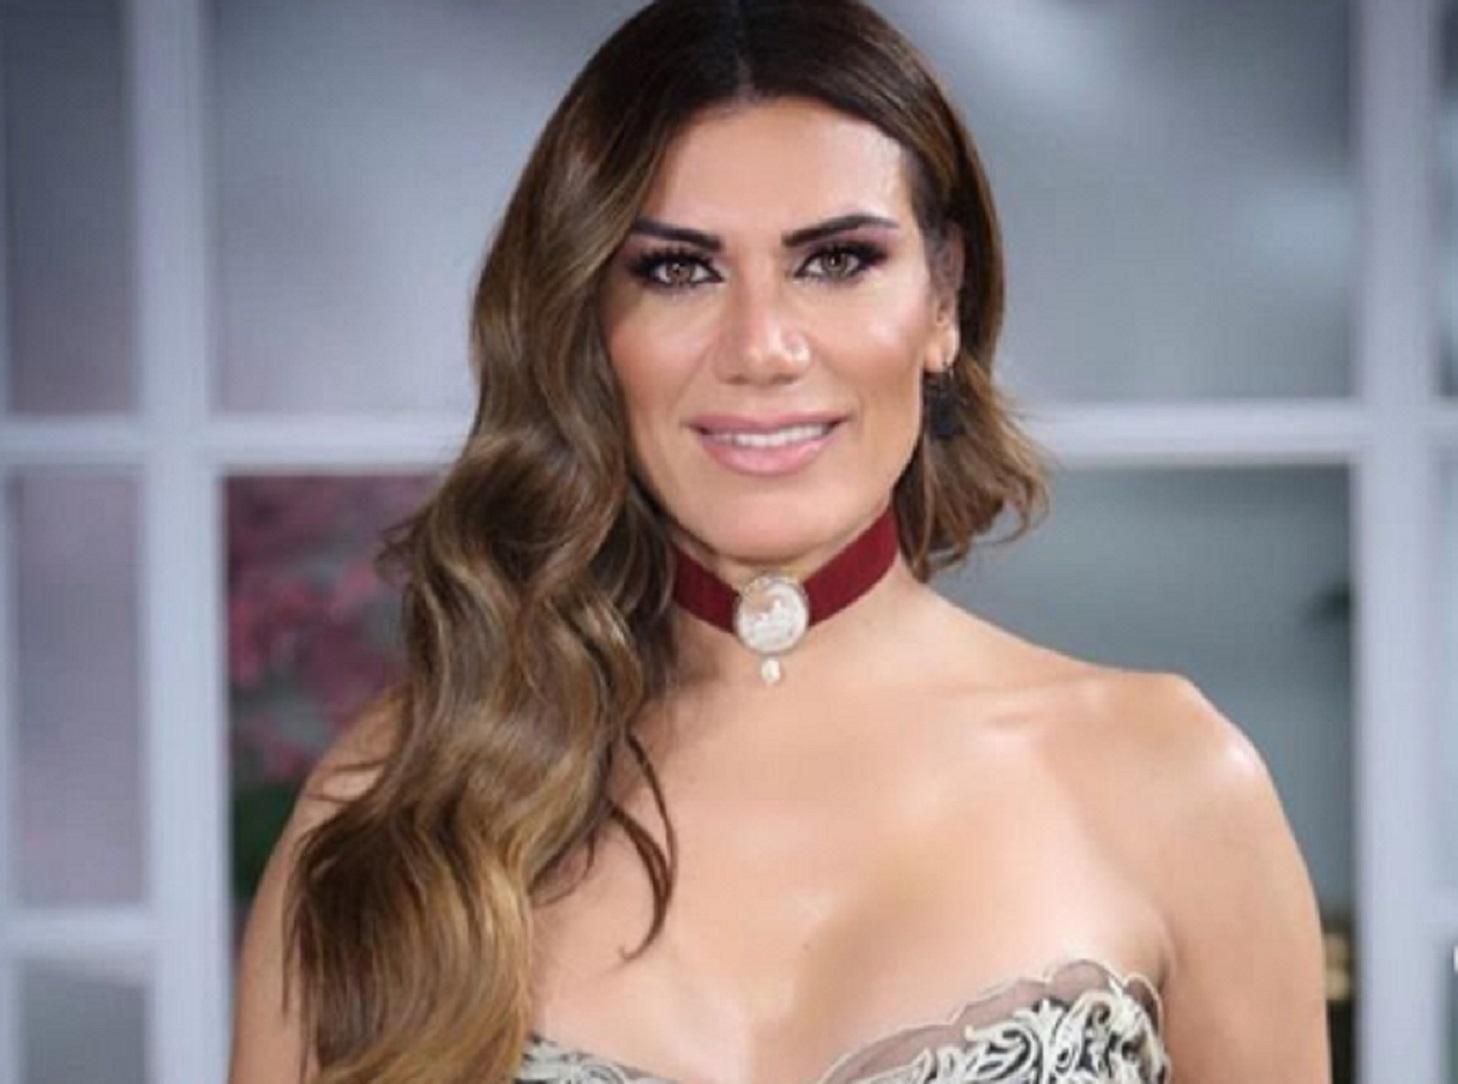 Florencia de la V Maradona